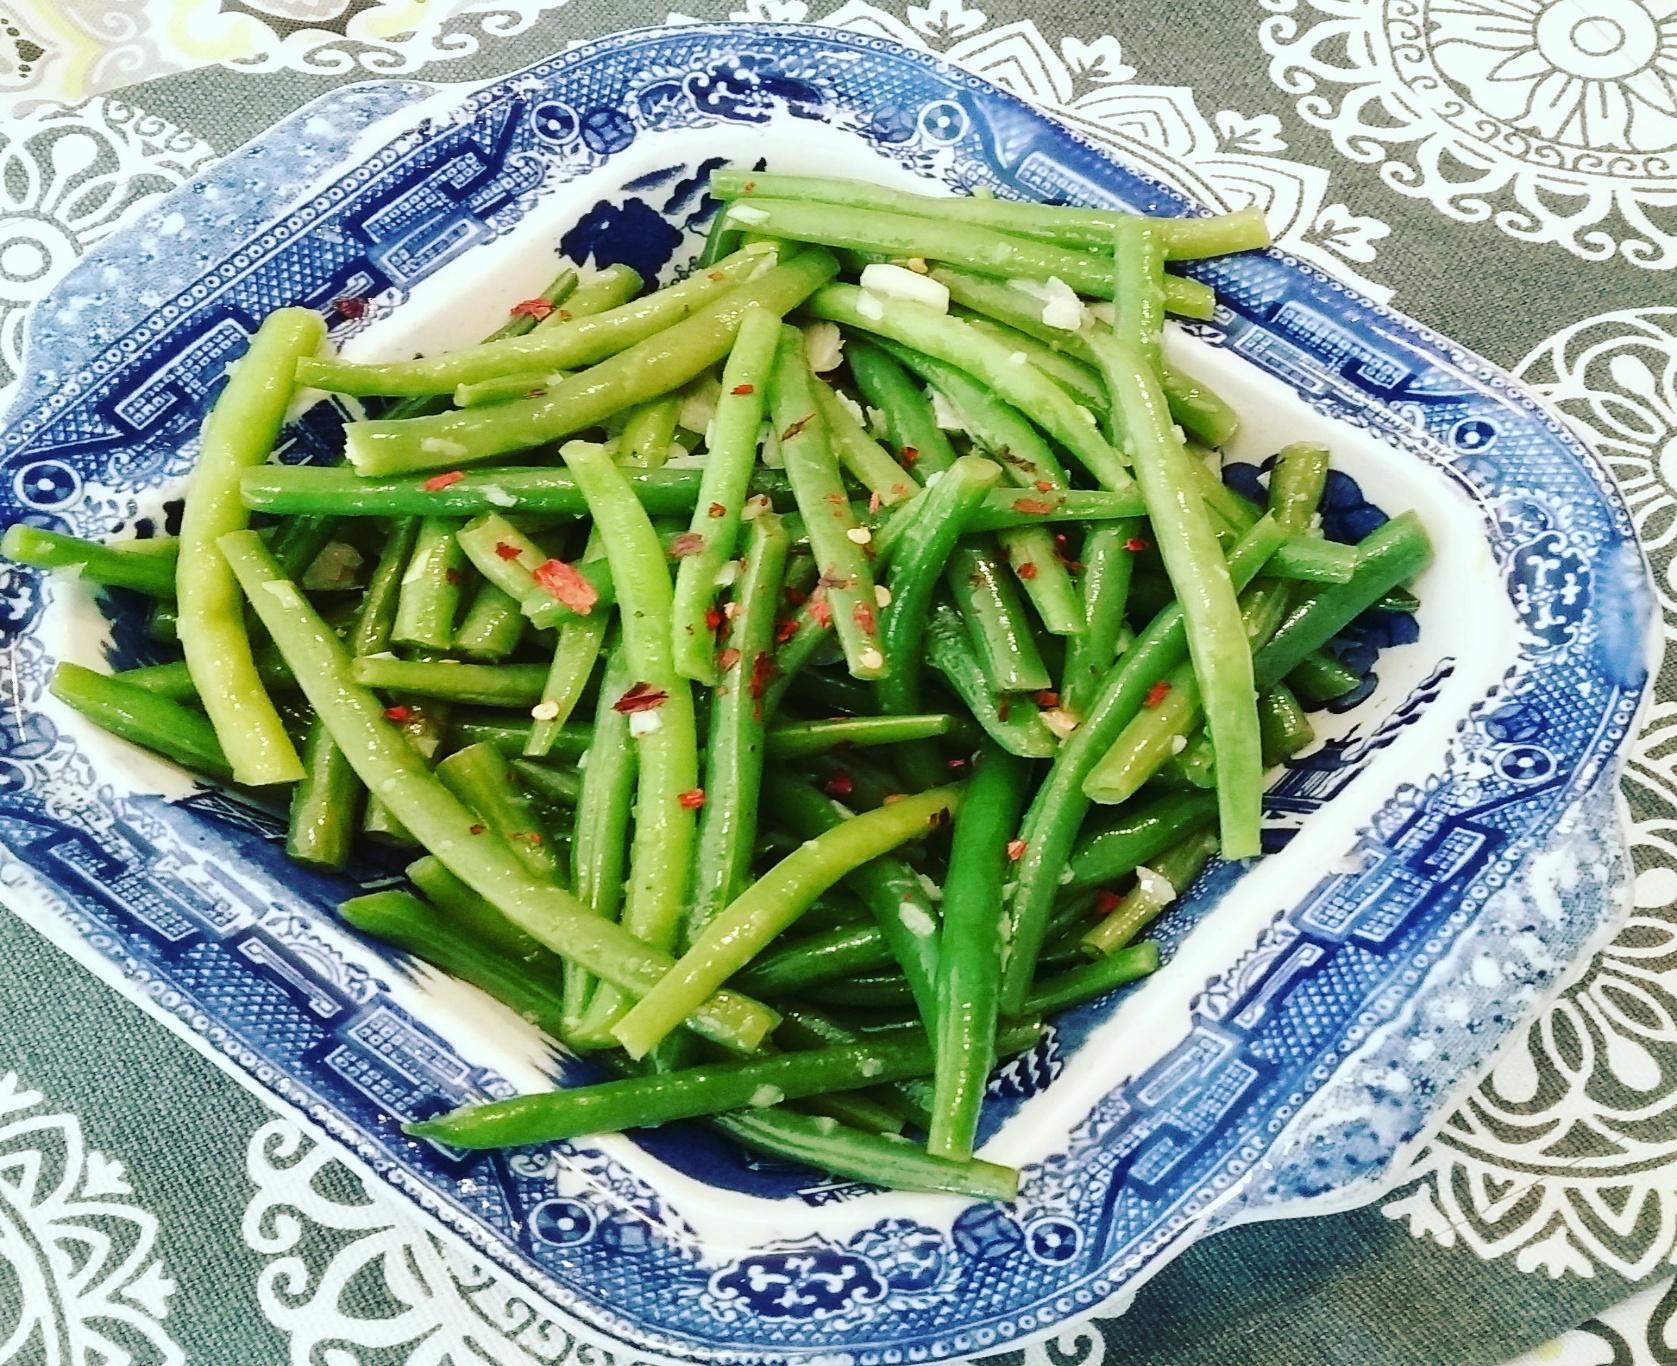 lemon and garlic green beans side dish